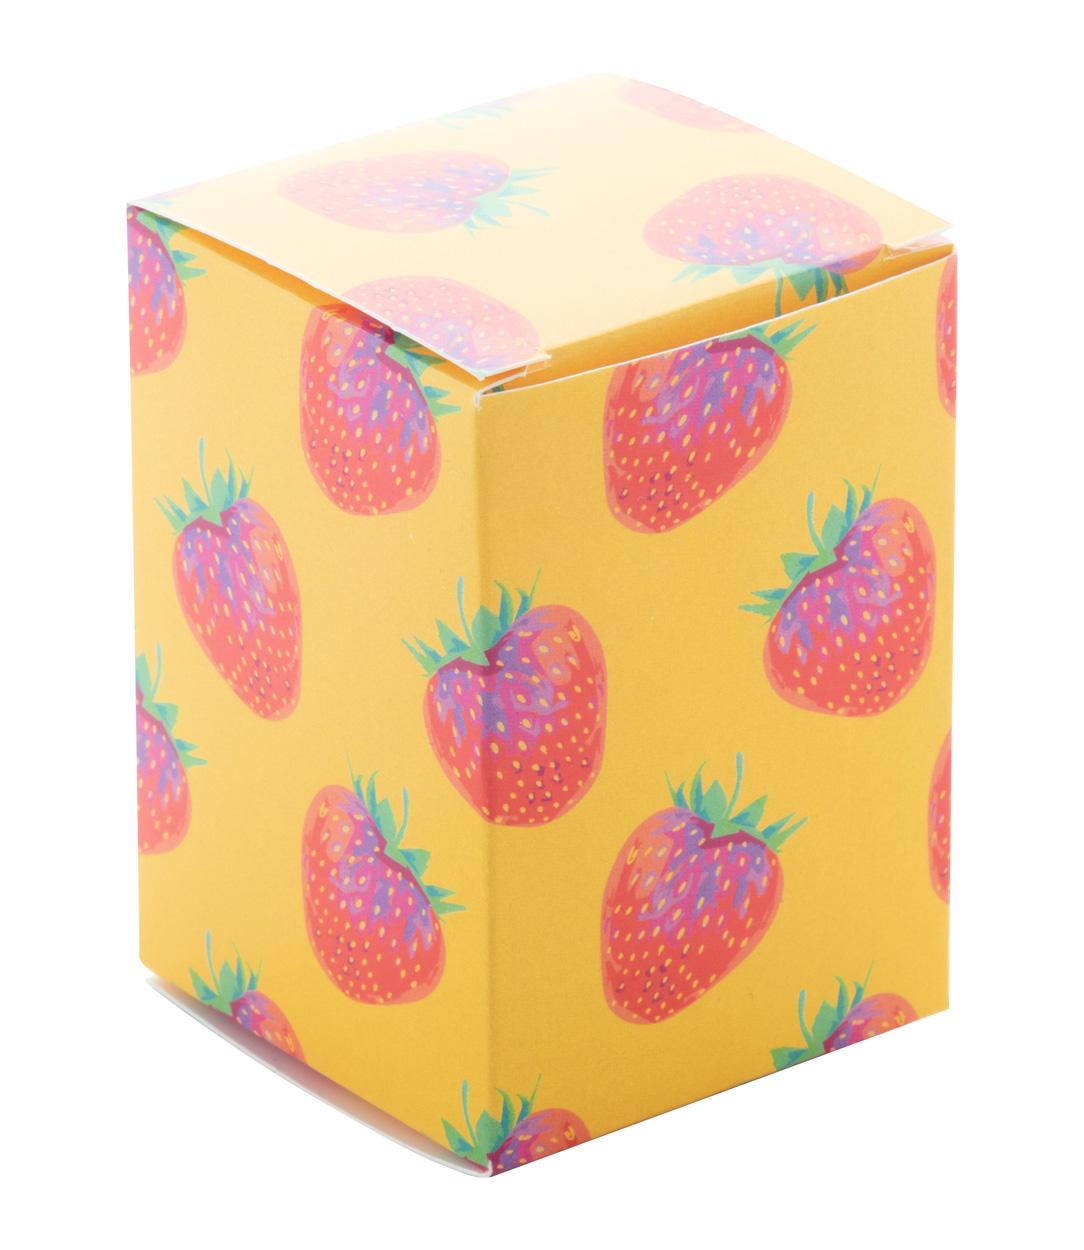 CreaBox Mobile Holder A custom box